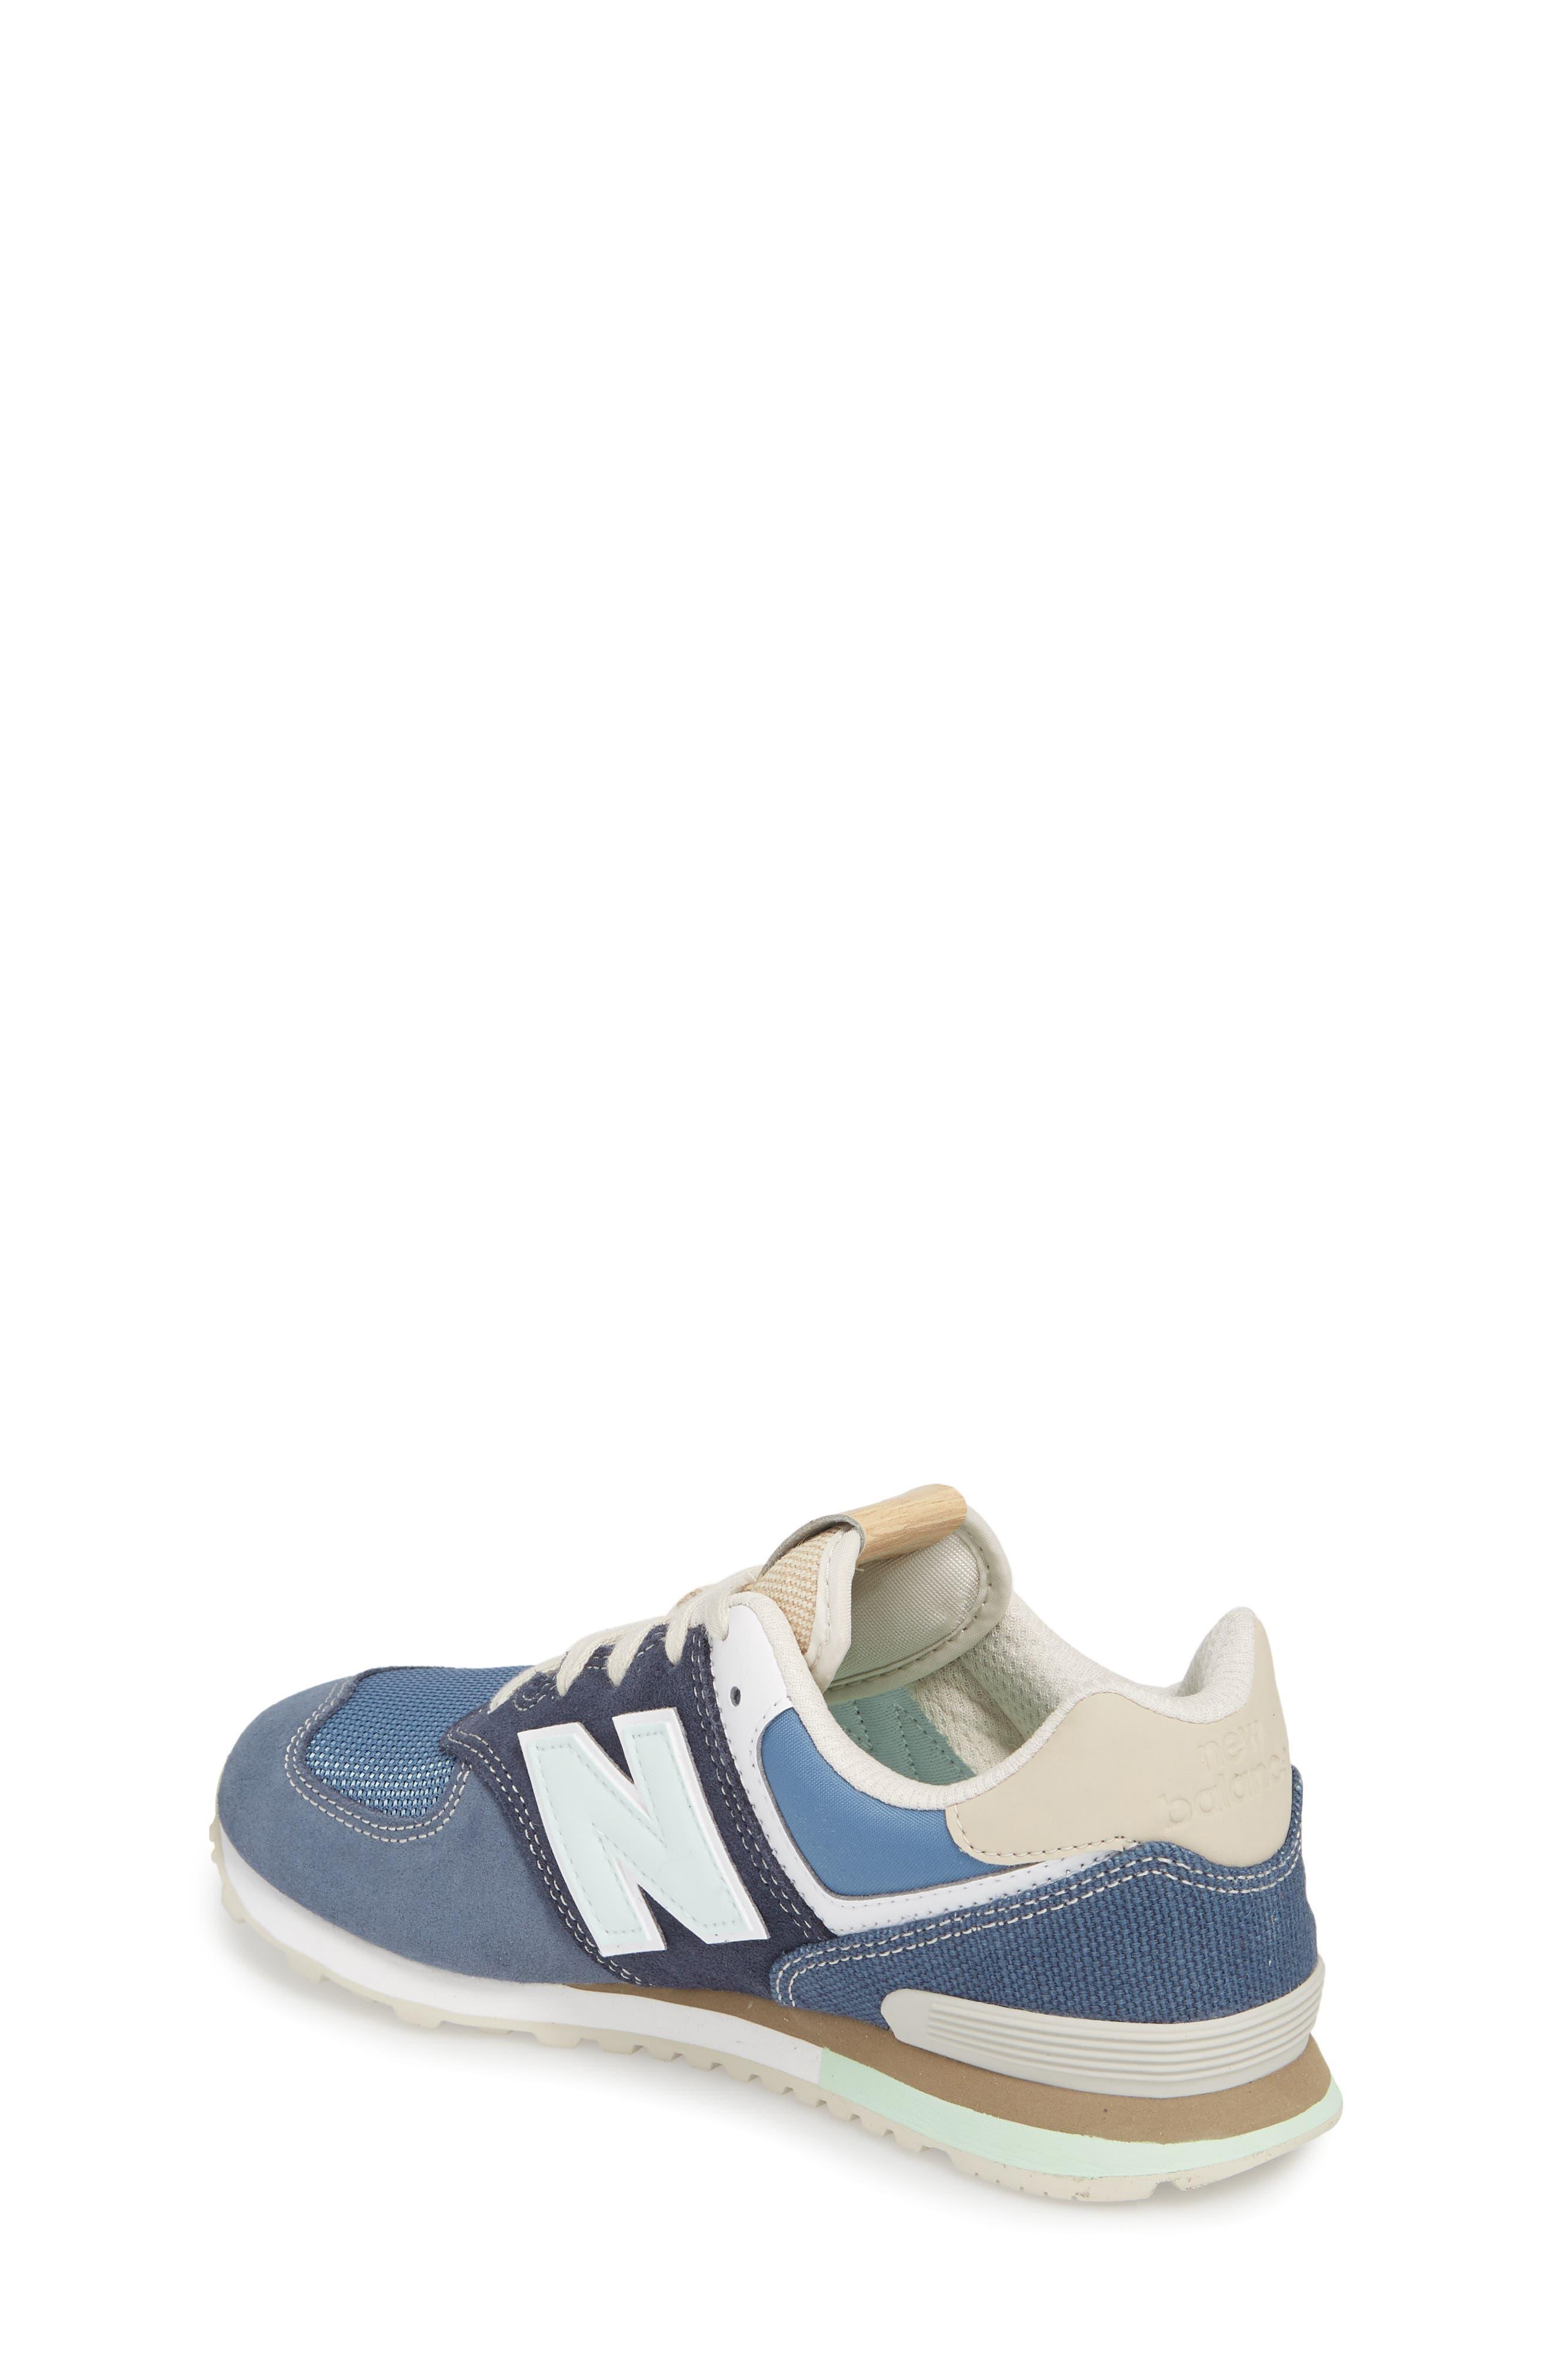 574 Retro Surf Sneaker,                             Alternate thumbnail 2, color,                             410